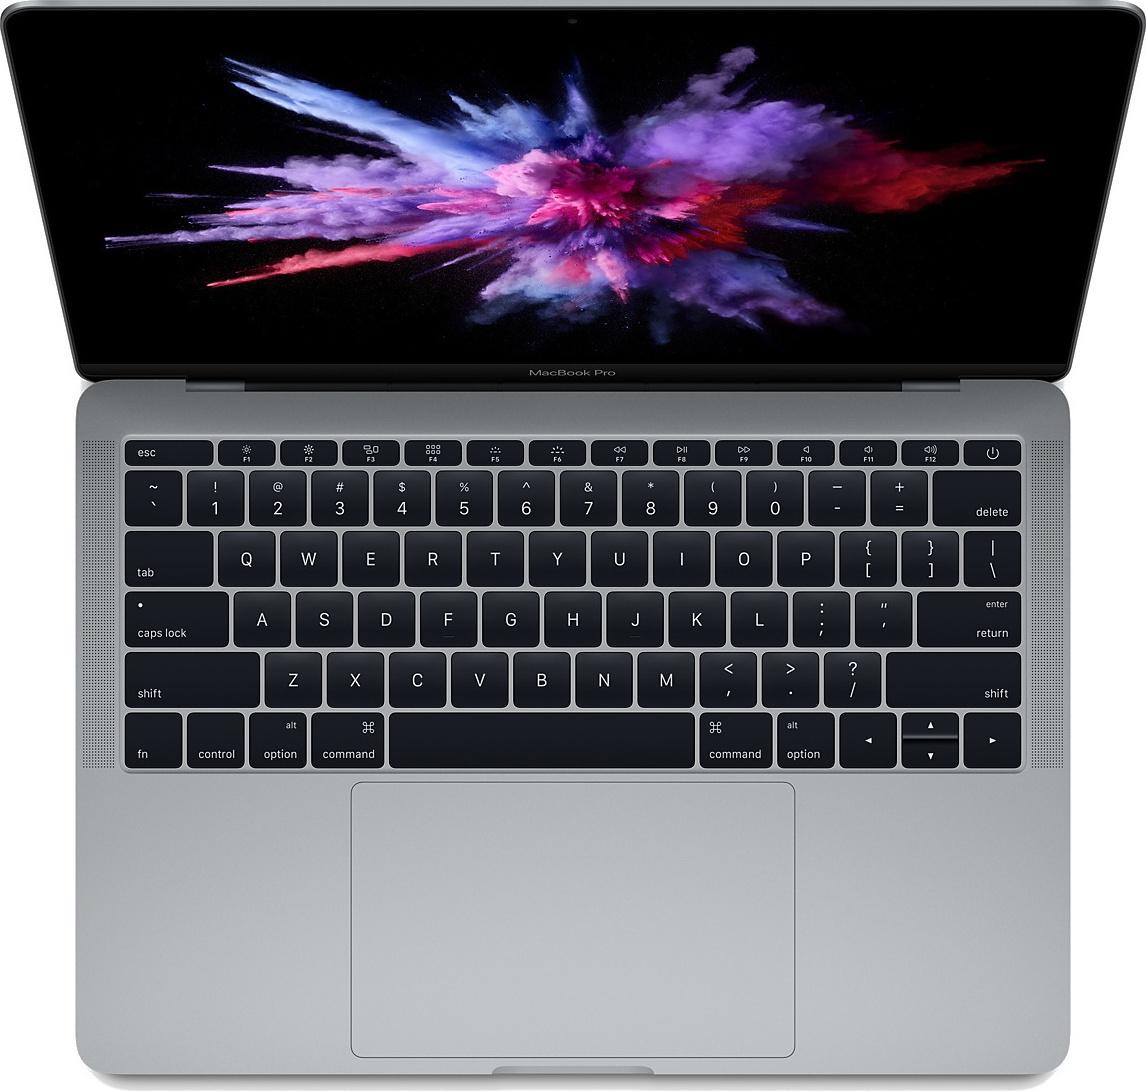 Apple Macbook Pro 13 Inch Mll42 I5 2 0ghz 8gb 256gb - Daftar Update Harga Terbaru Indonesia